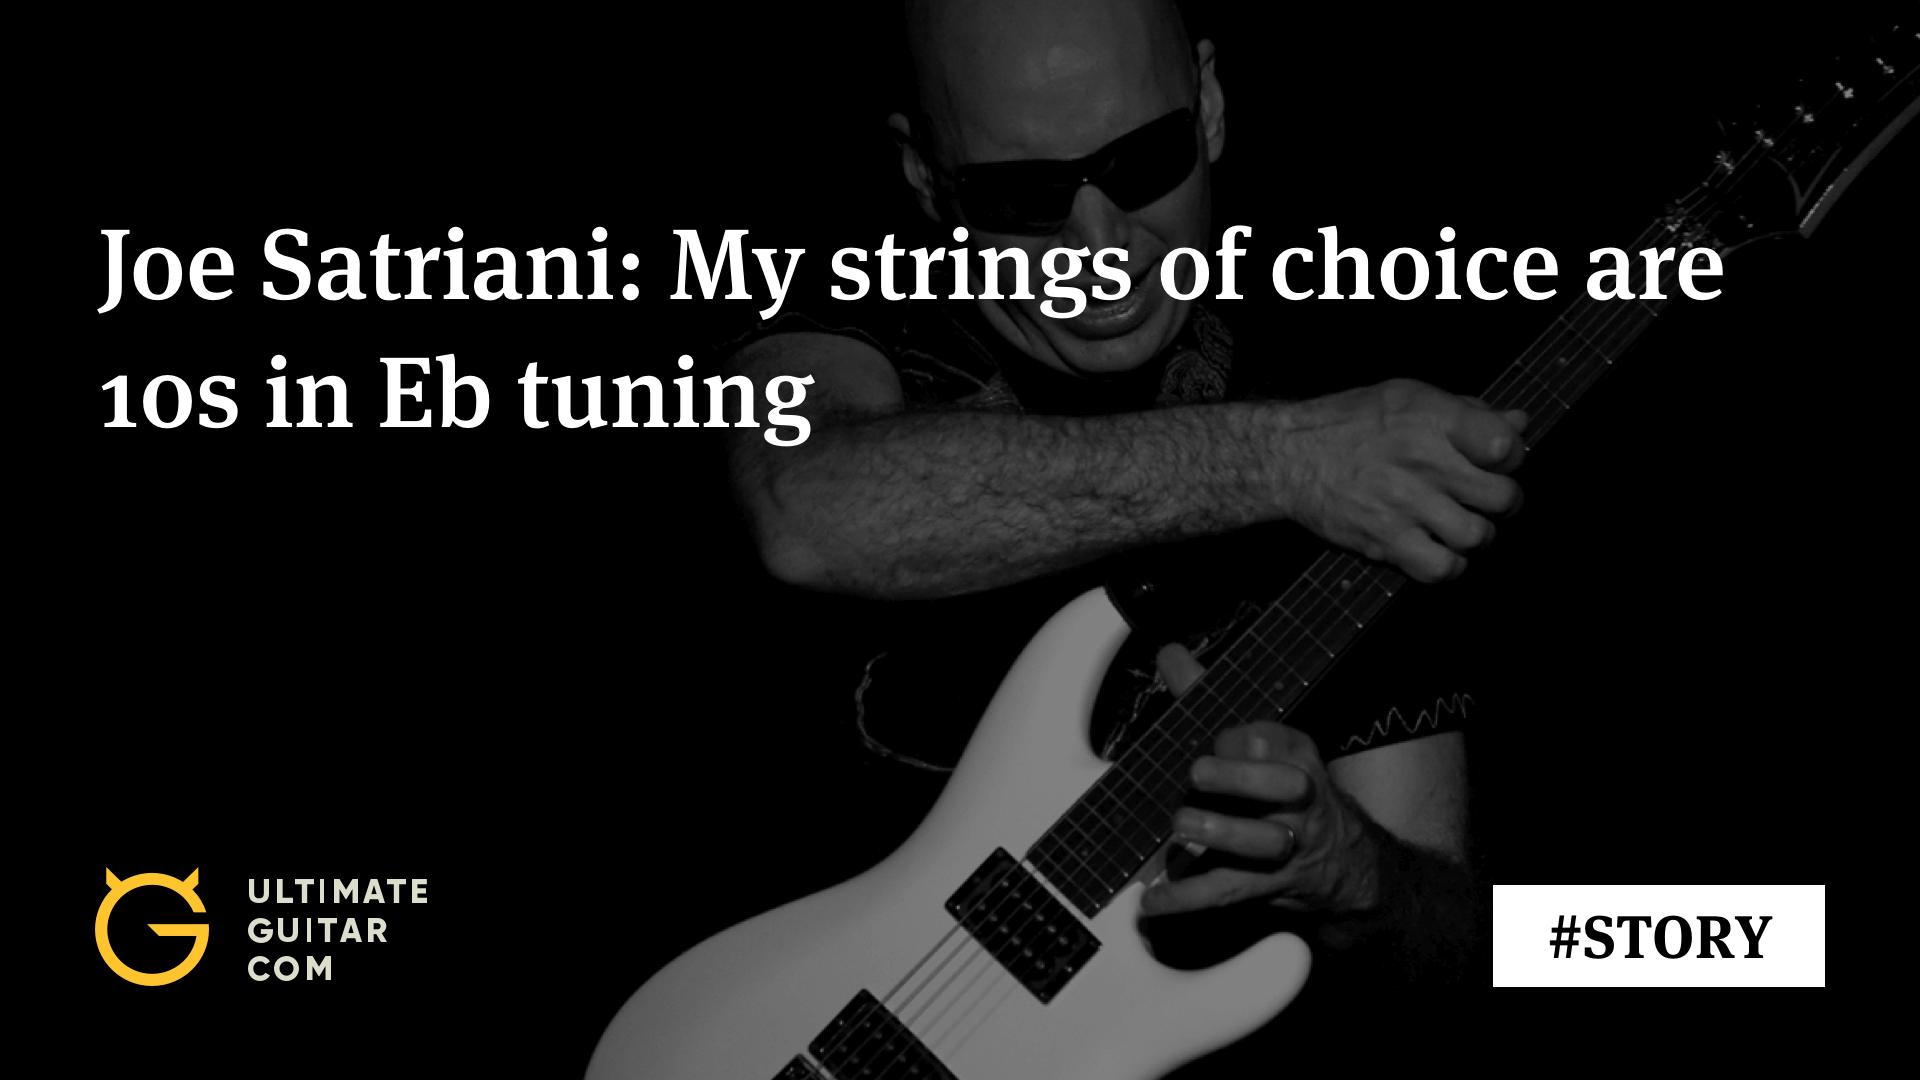 joe satriani what 39 s my ideal string gauge music news ultimate guitar com. Black Bedroom Furniture Sets. Home Design Ideas